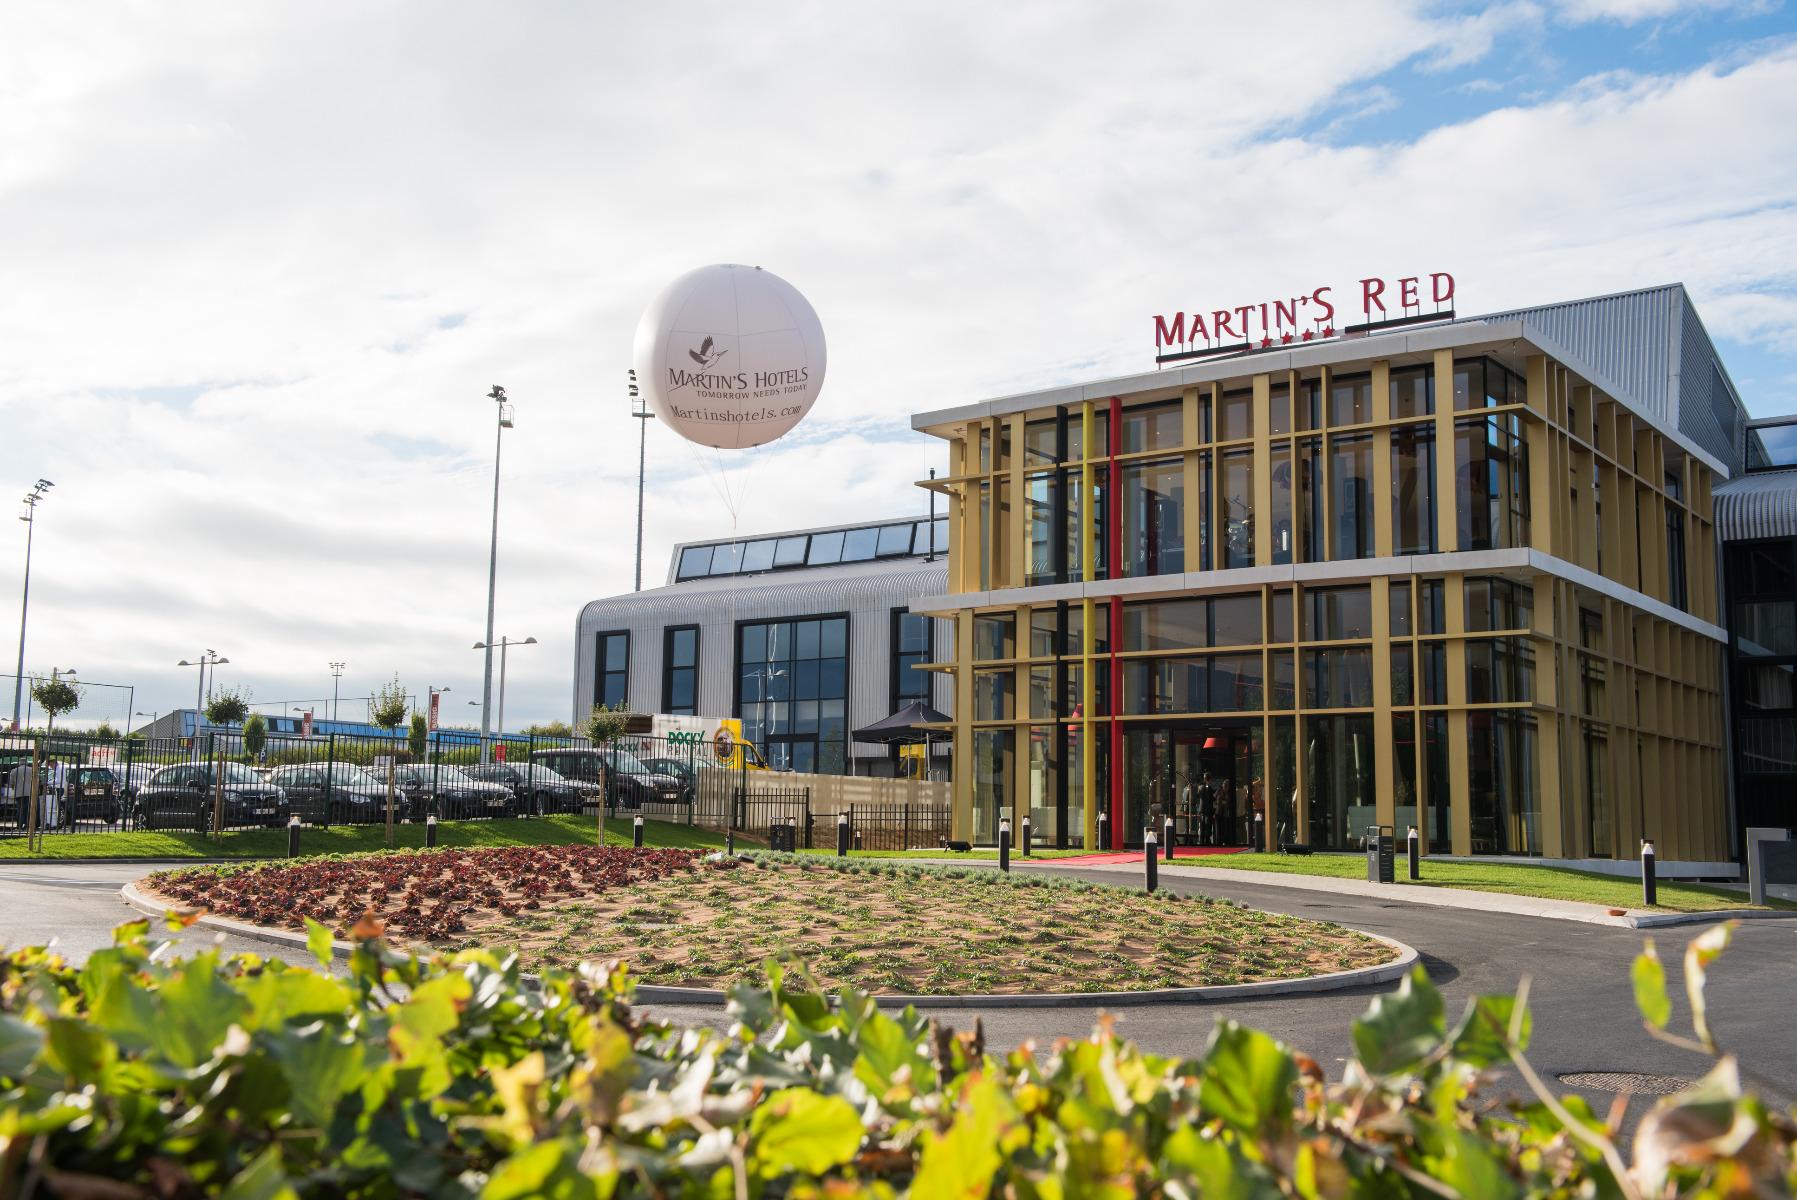 Golfexpedition-Golfreizen-België-Brussel-Red-course-gebouw-planten-rond